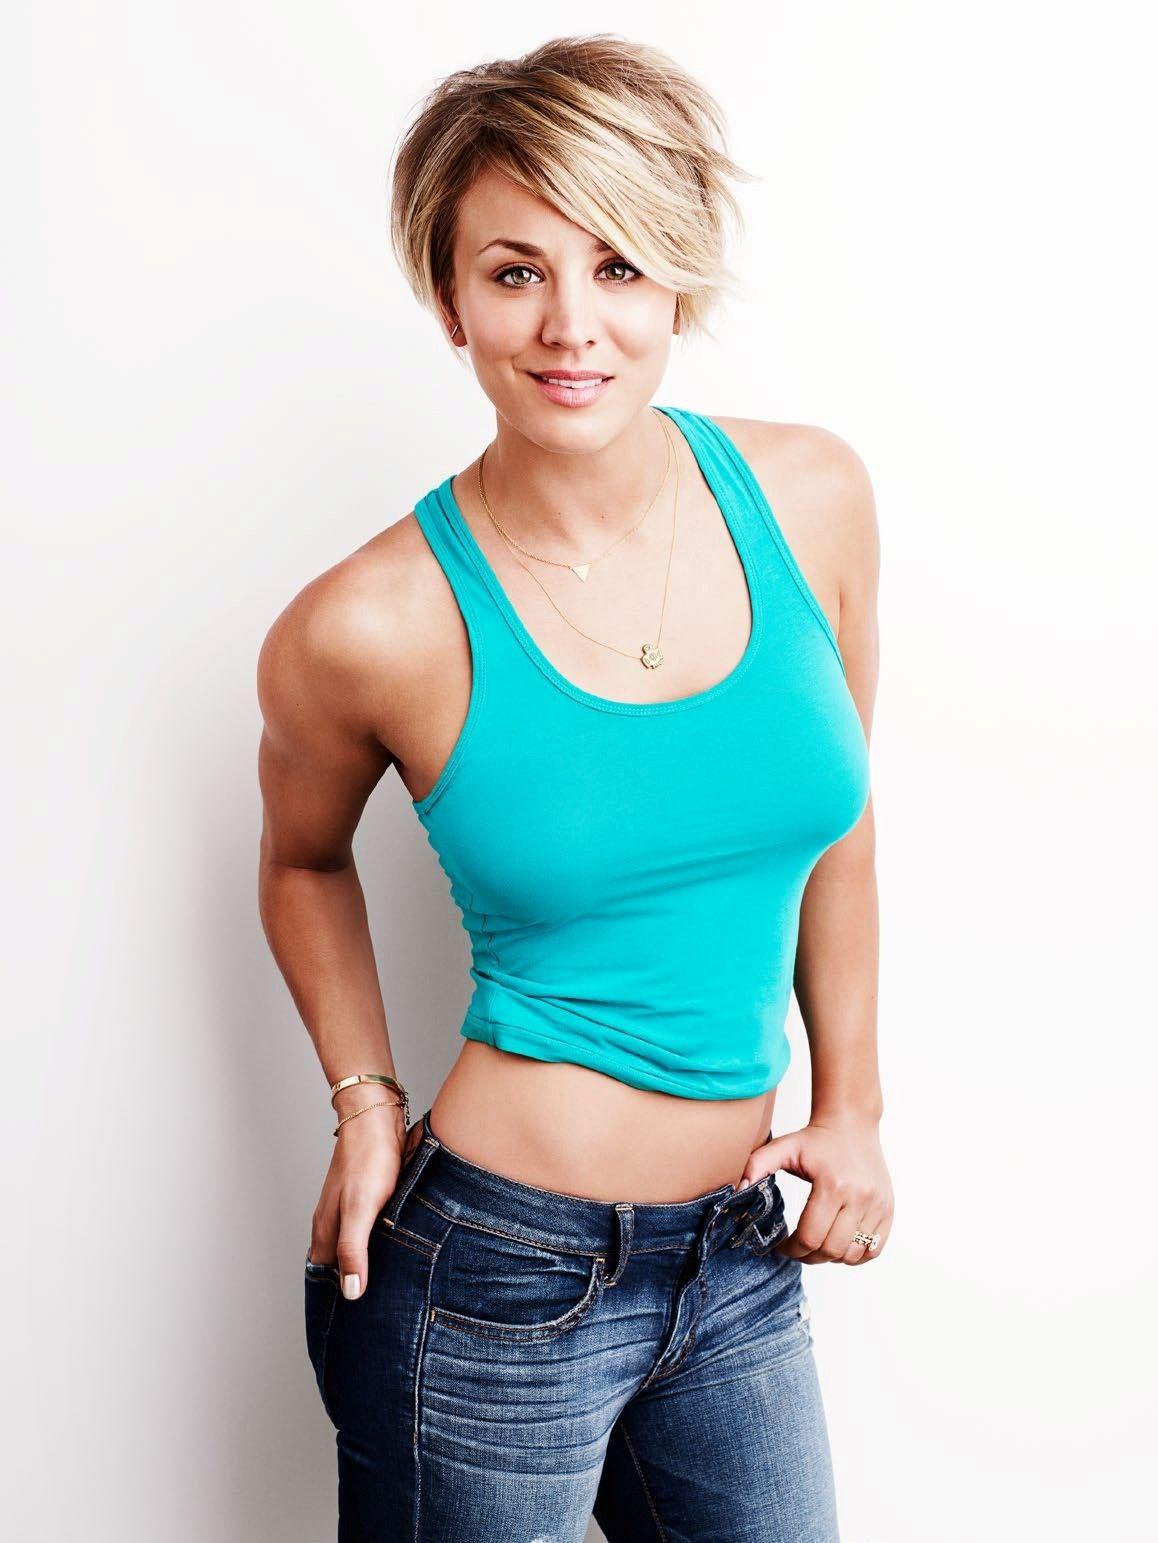 Kaley Cuoco - Women's Health September 2014